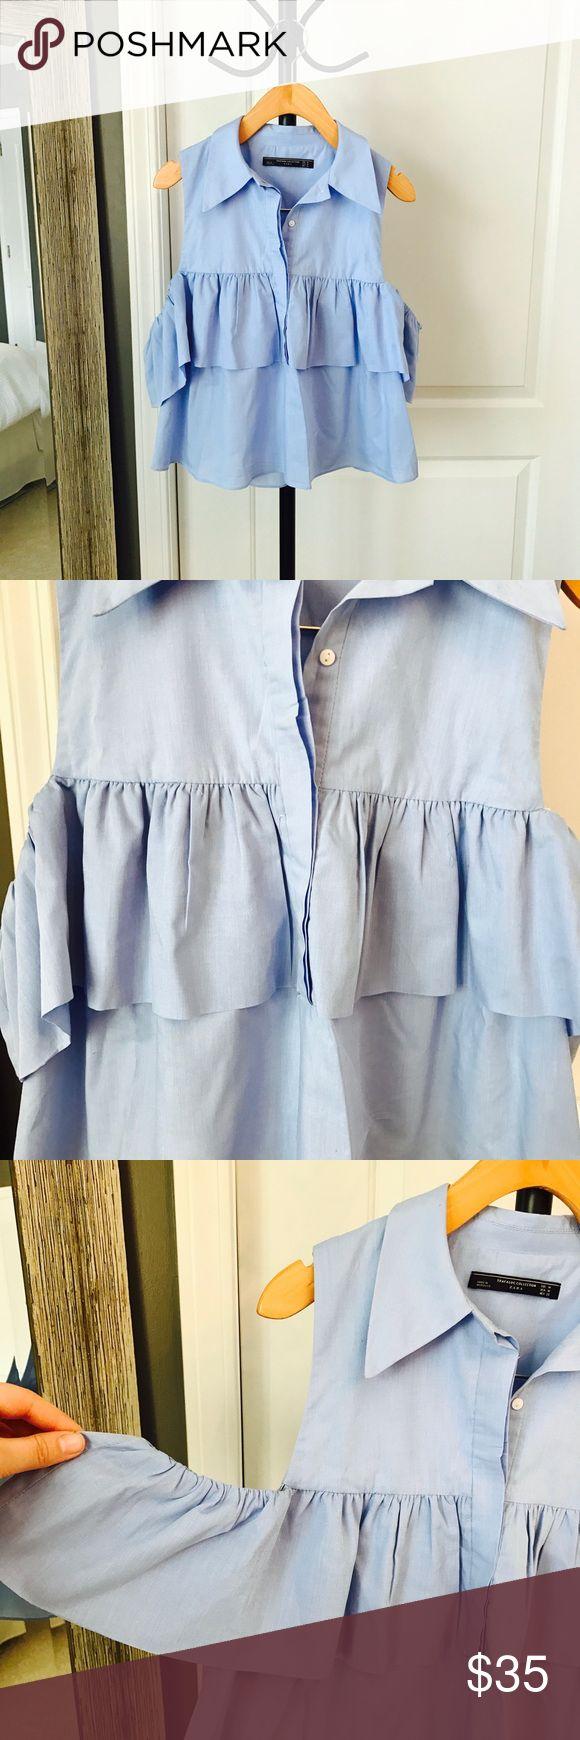 Zara Ruffled Blouse Brand new & never worn. 55% cotton & 45% polyester. Zara Tops Button Down Shirts